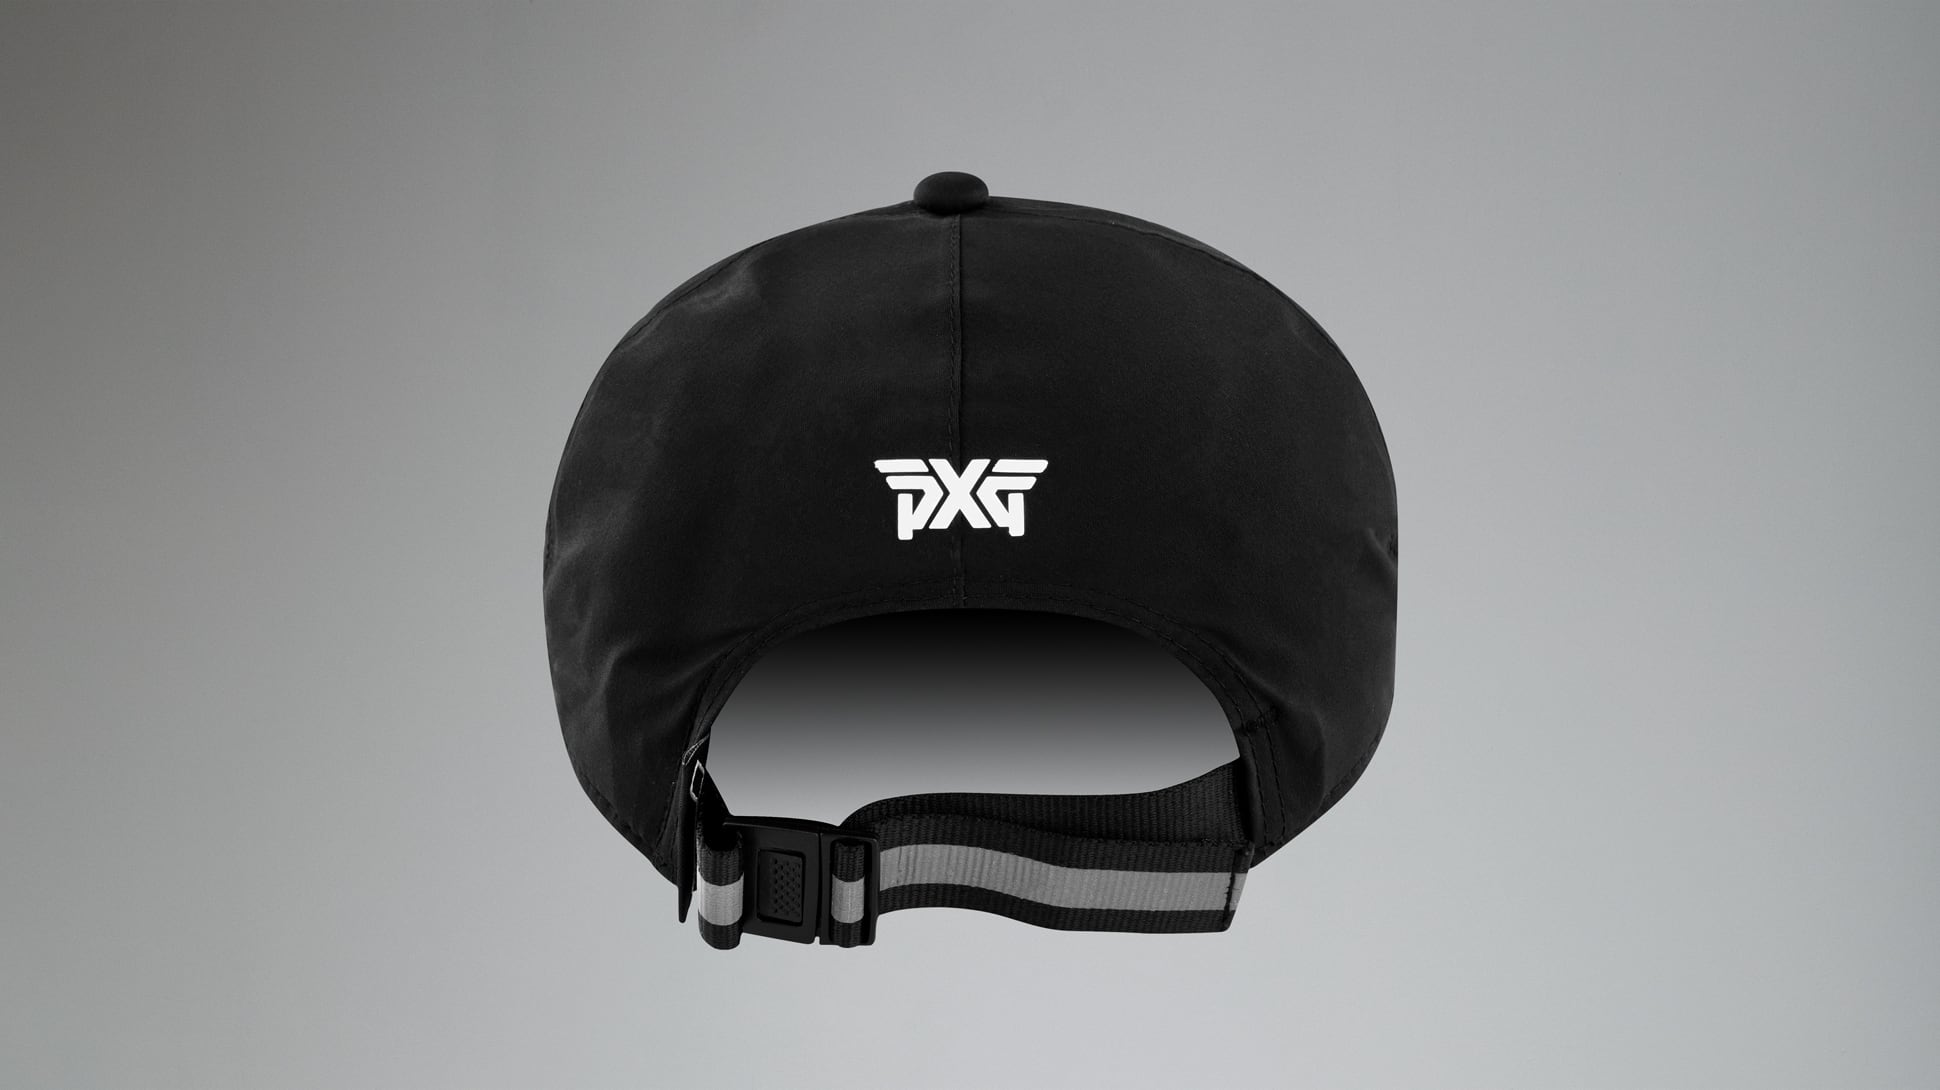 9TWENTY GORE-TEX Strapback Cap Image 3